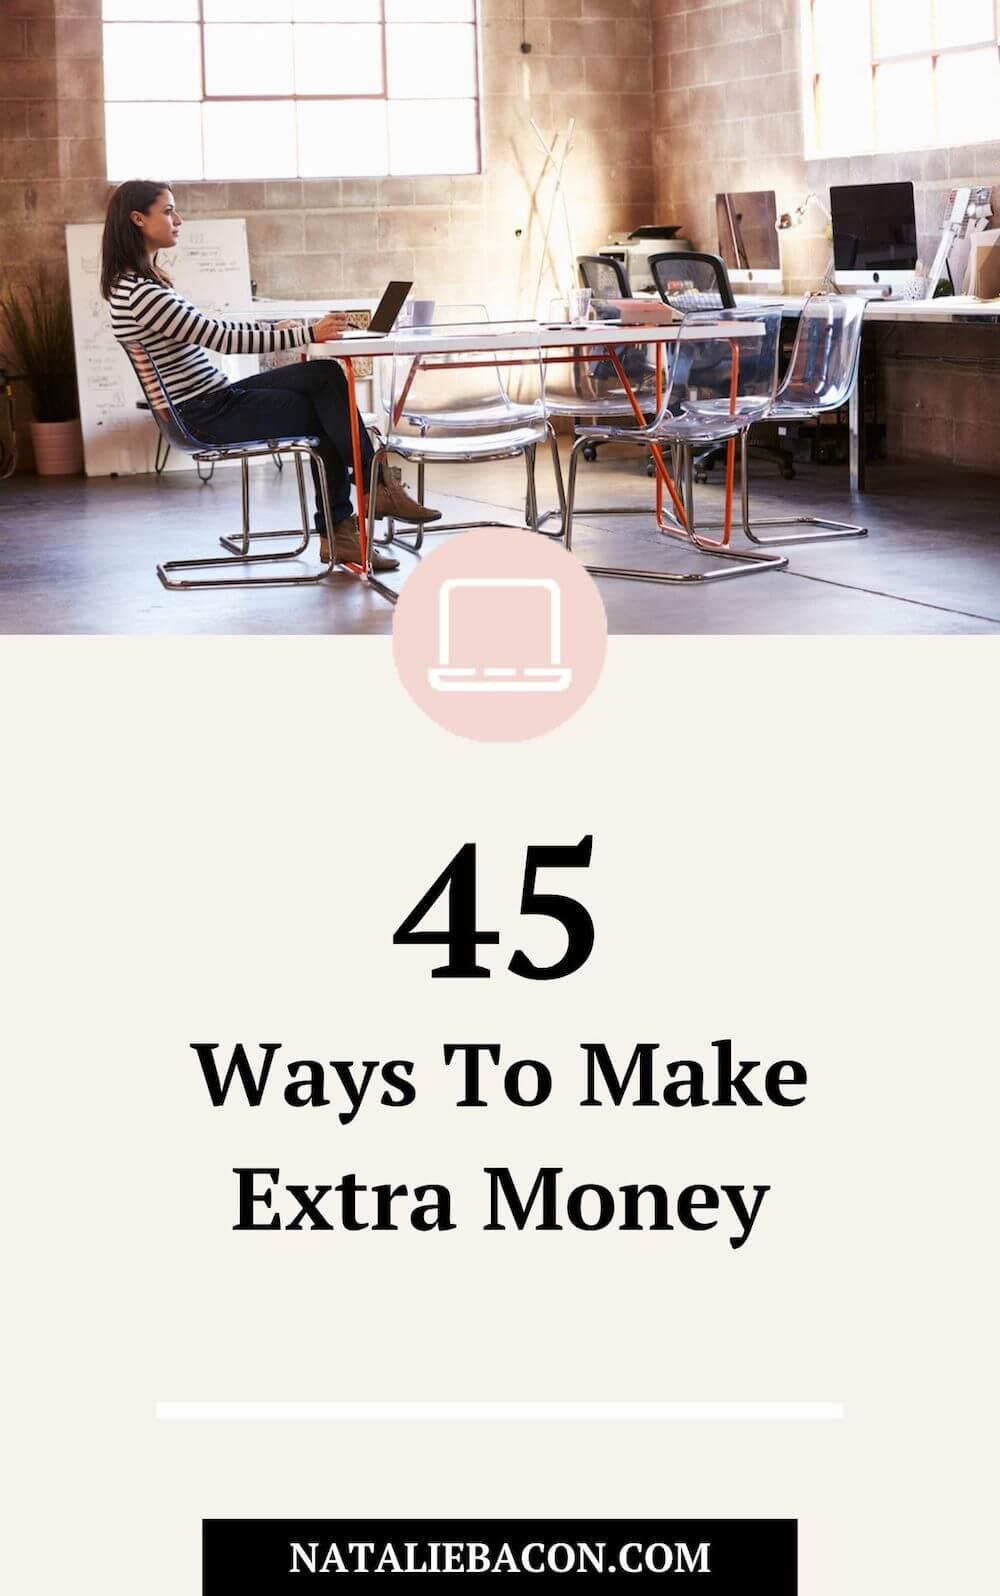 45 Ways to Make Extra Money